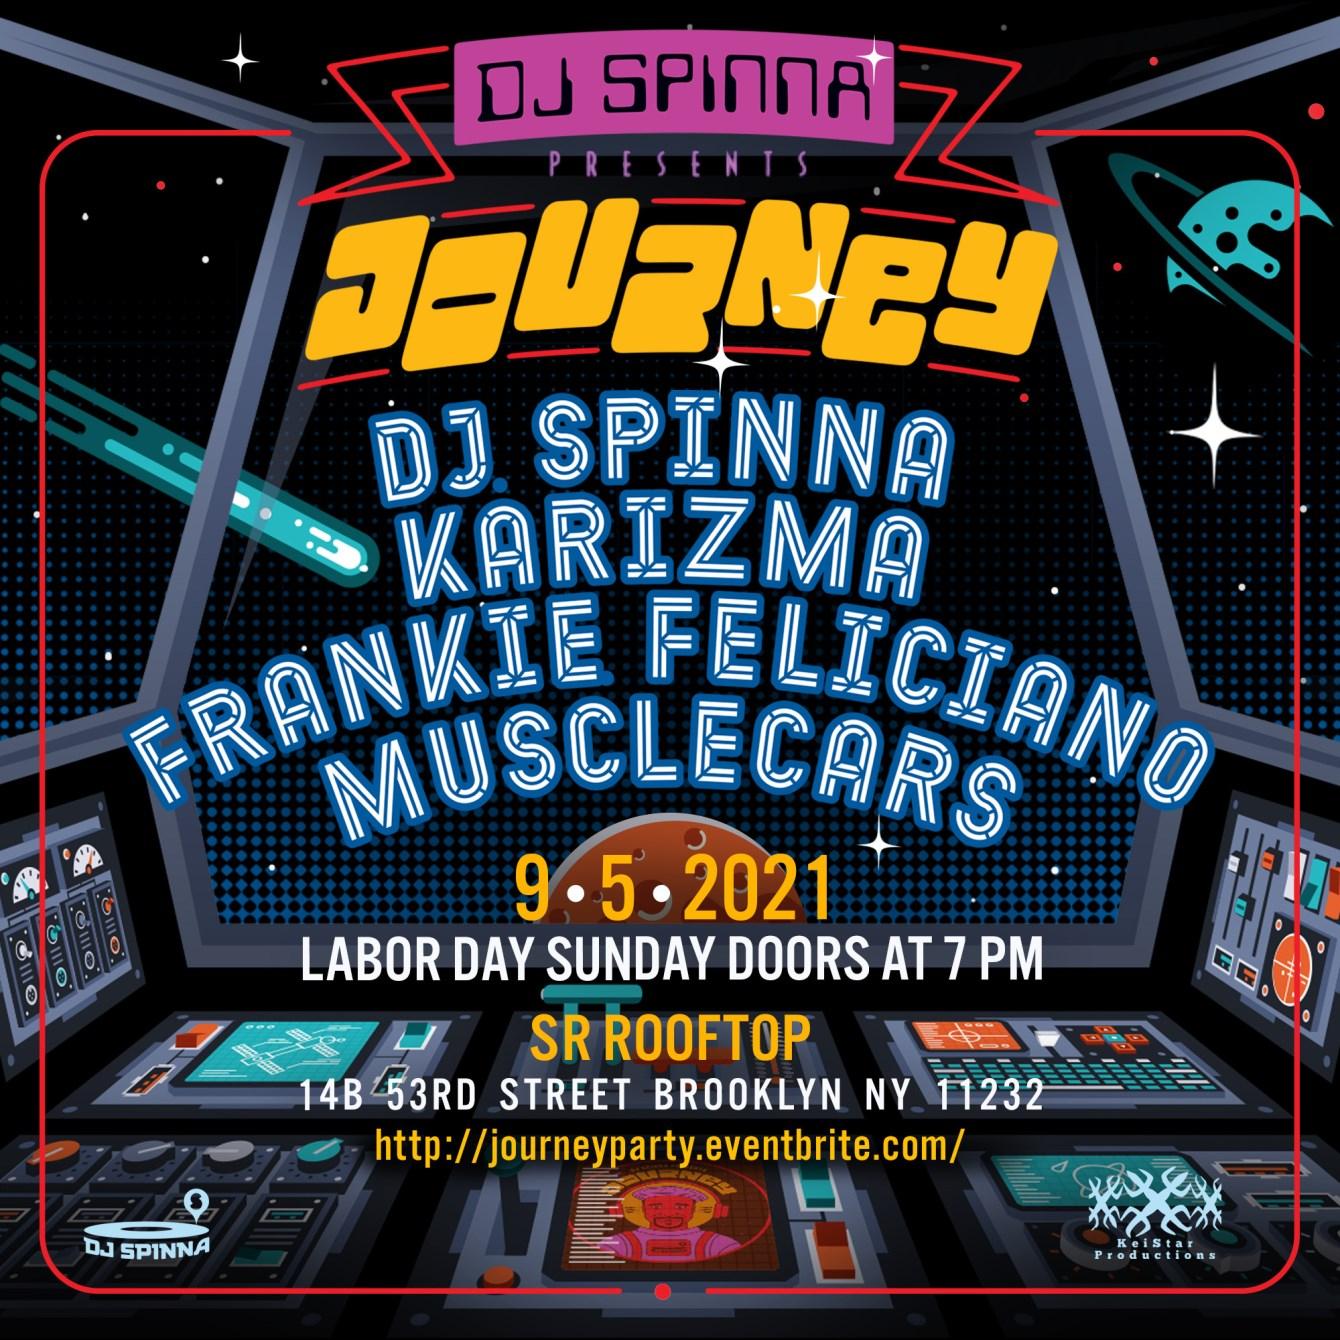 Journey with DJ Spinna, Karizma, Frankie Feliciano, Musclecars - Flyer front